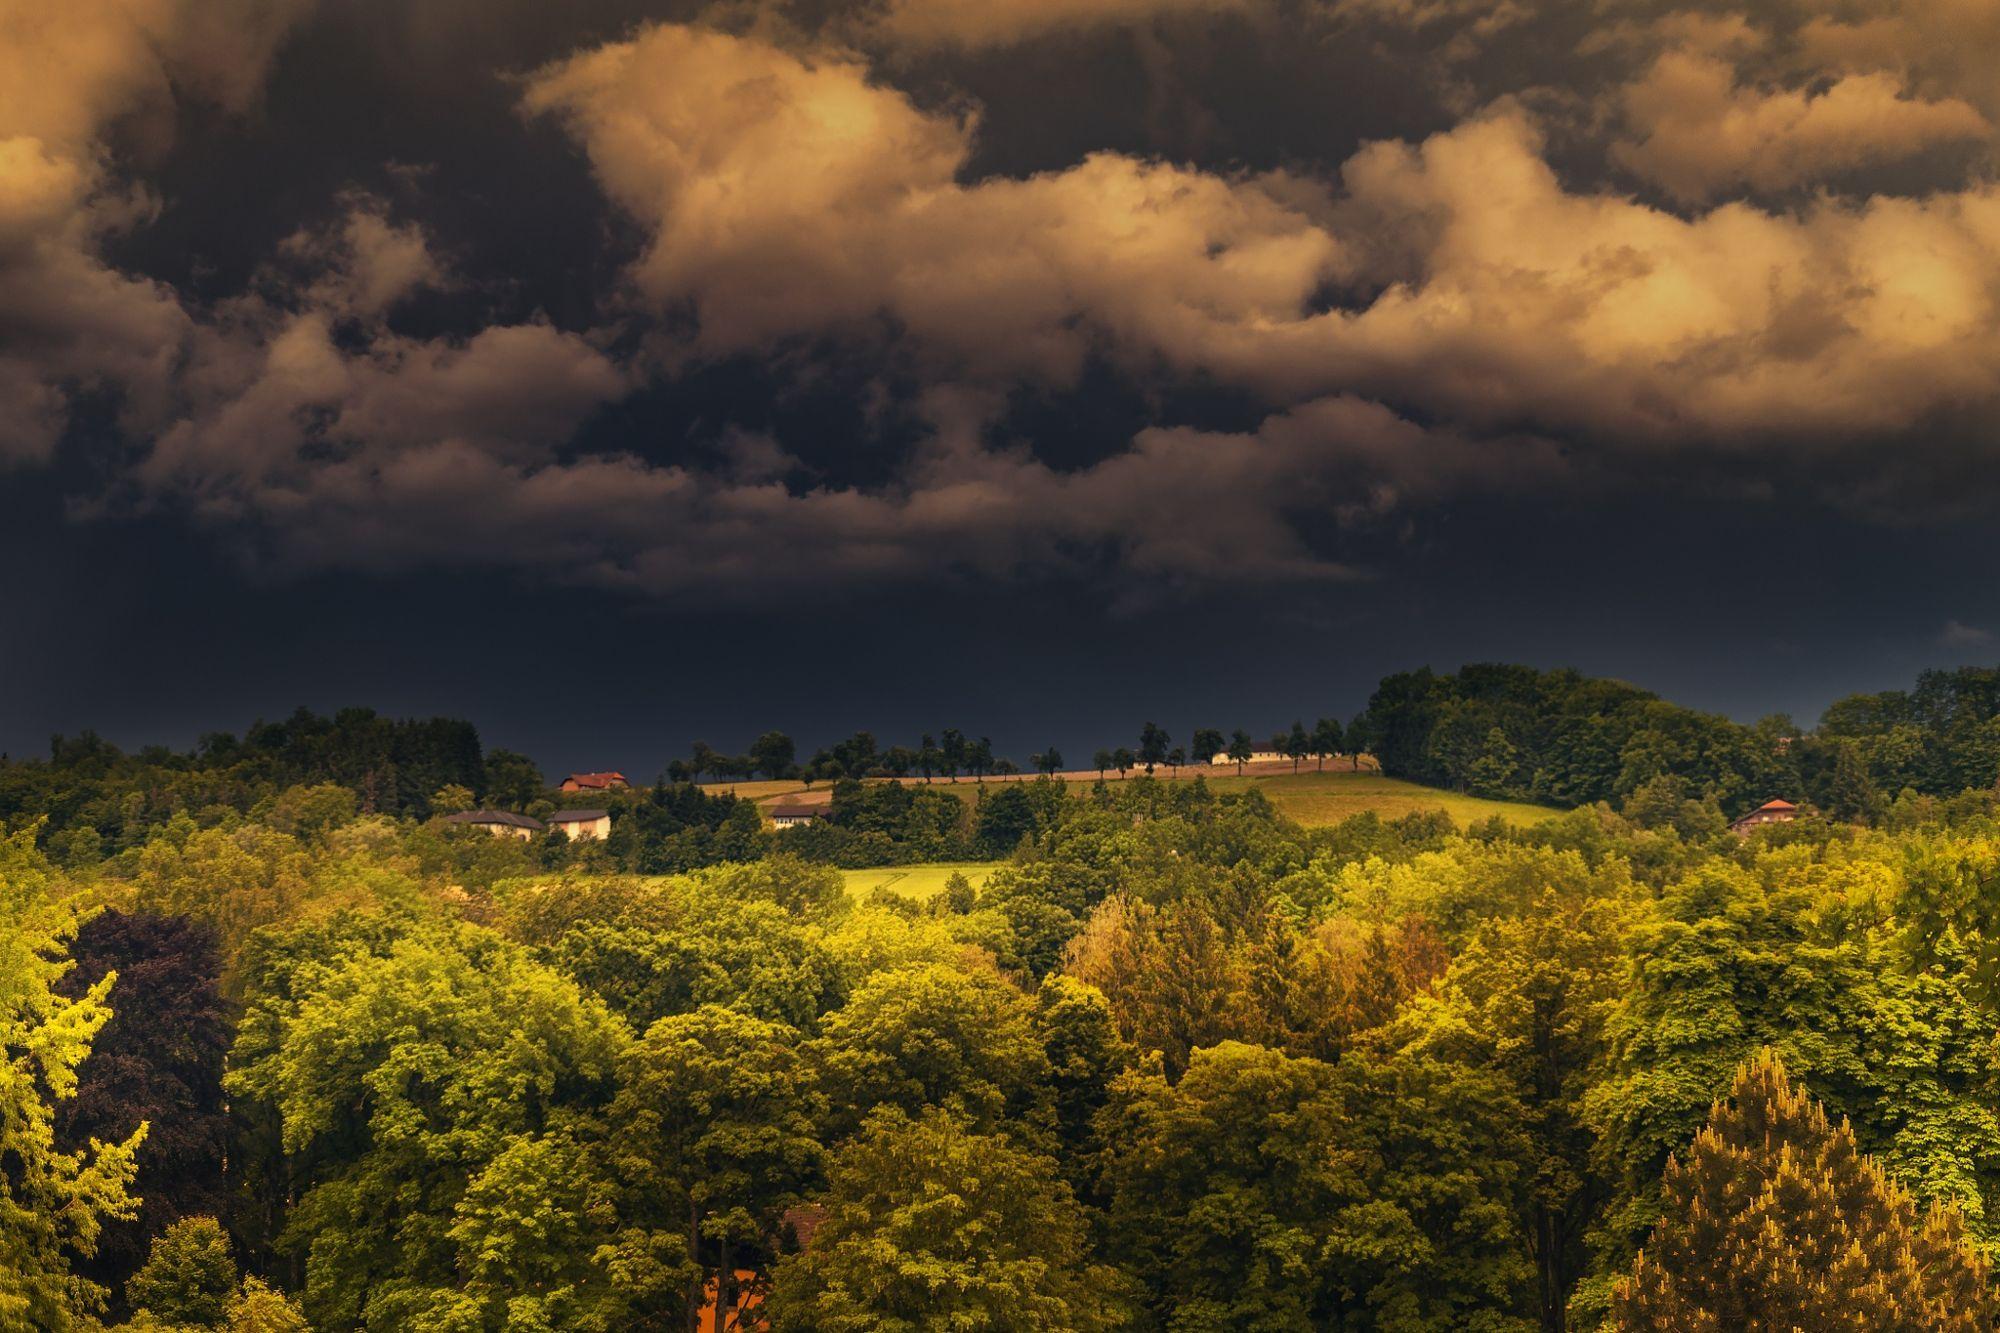 #Photography before thunderstorm by Hribernigg_Richard https://t.co/2eVAJyE2Mh #IFTTT #Nature #Travel https://t.co/n8Ngepdm7b #followme #photography